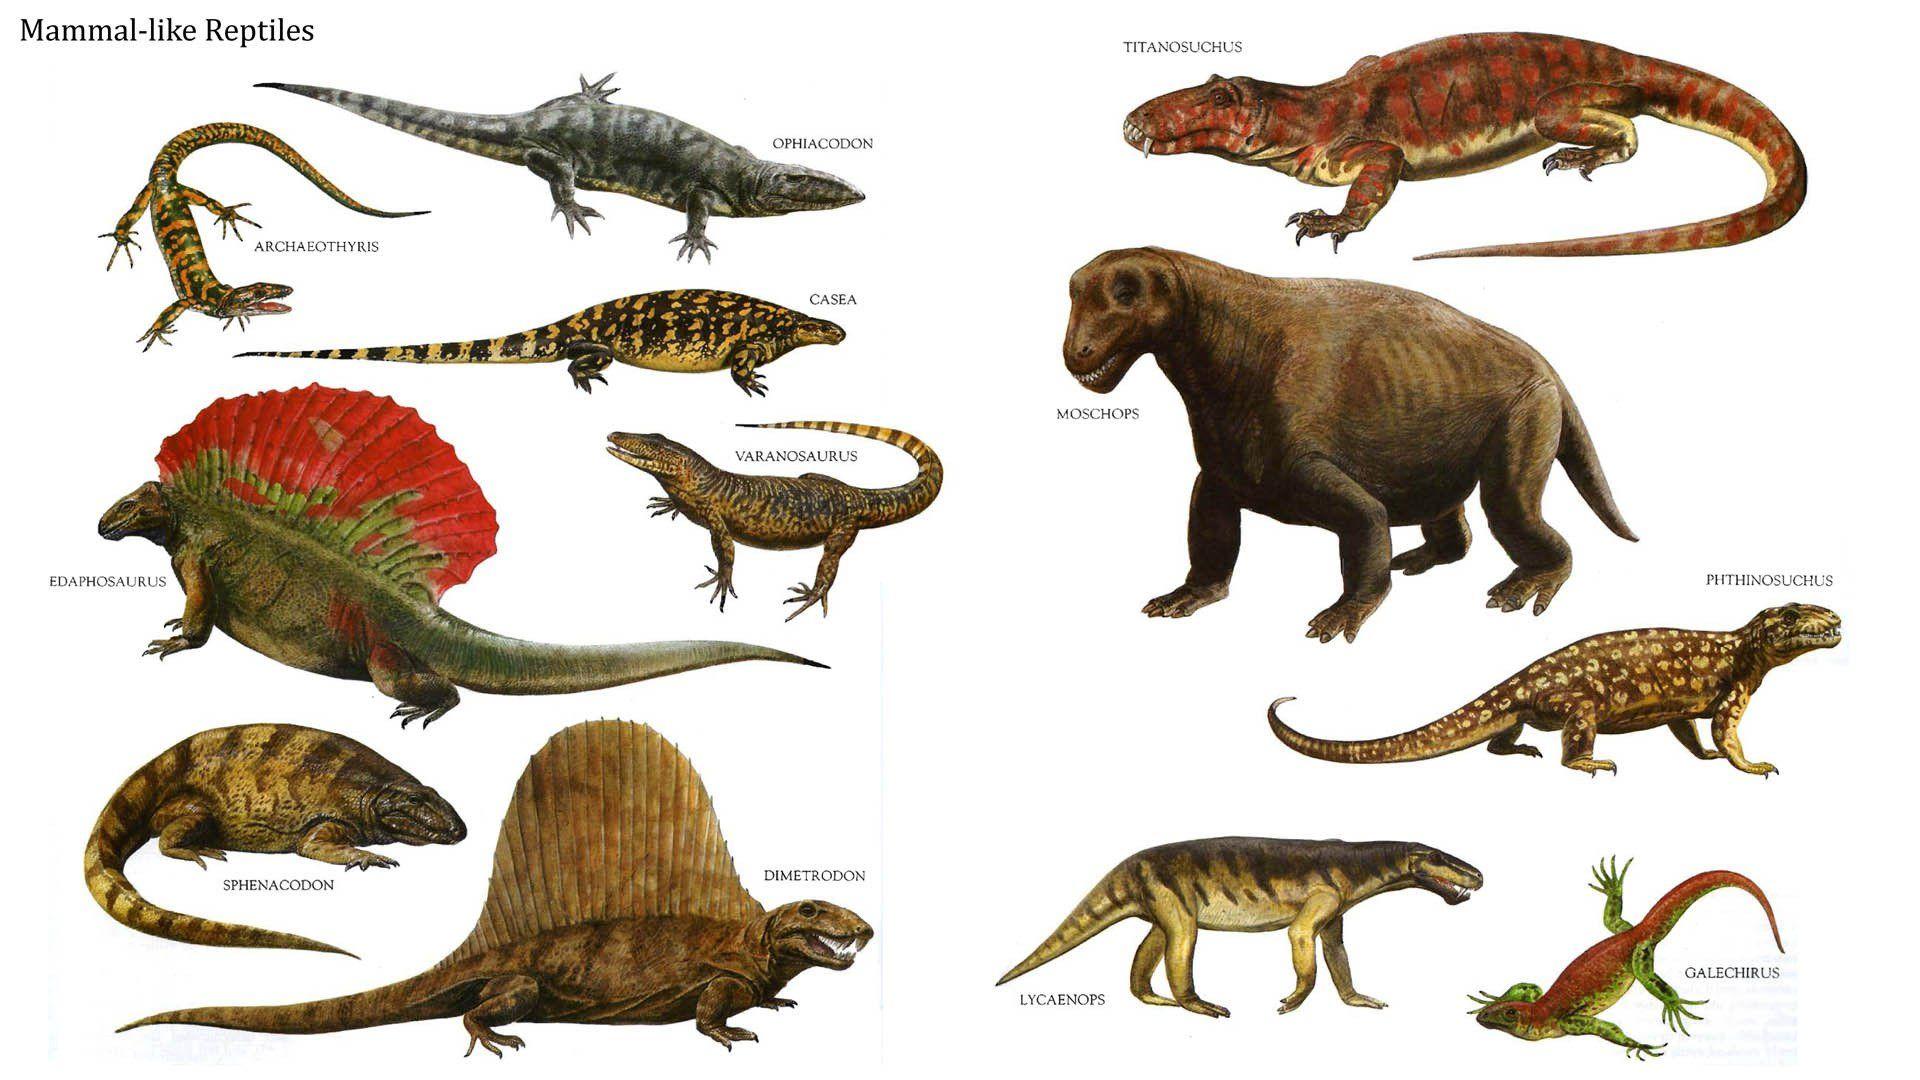 Reptiles antiguos | Especies extintas | Pinterest ...